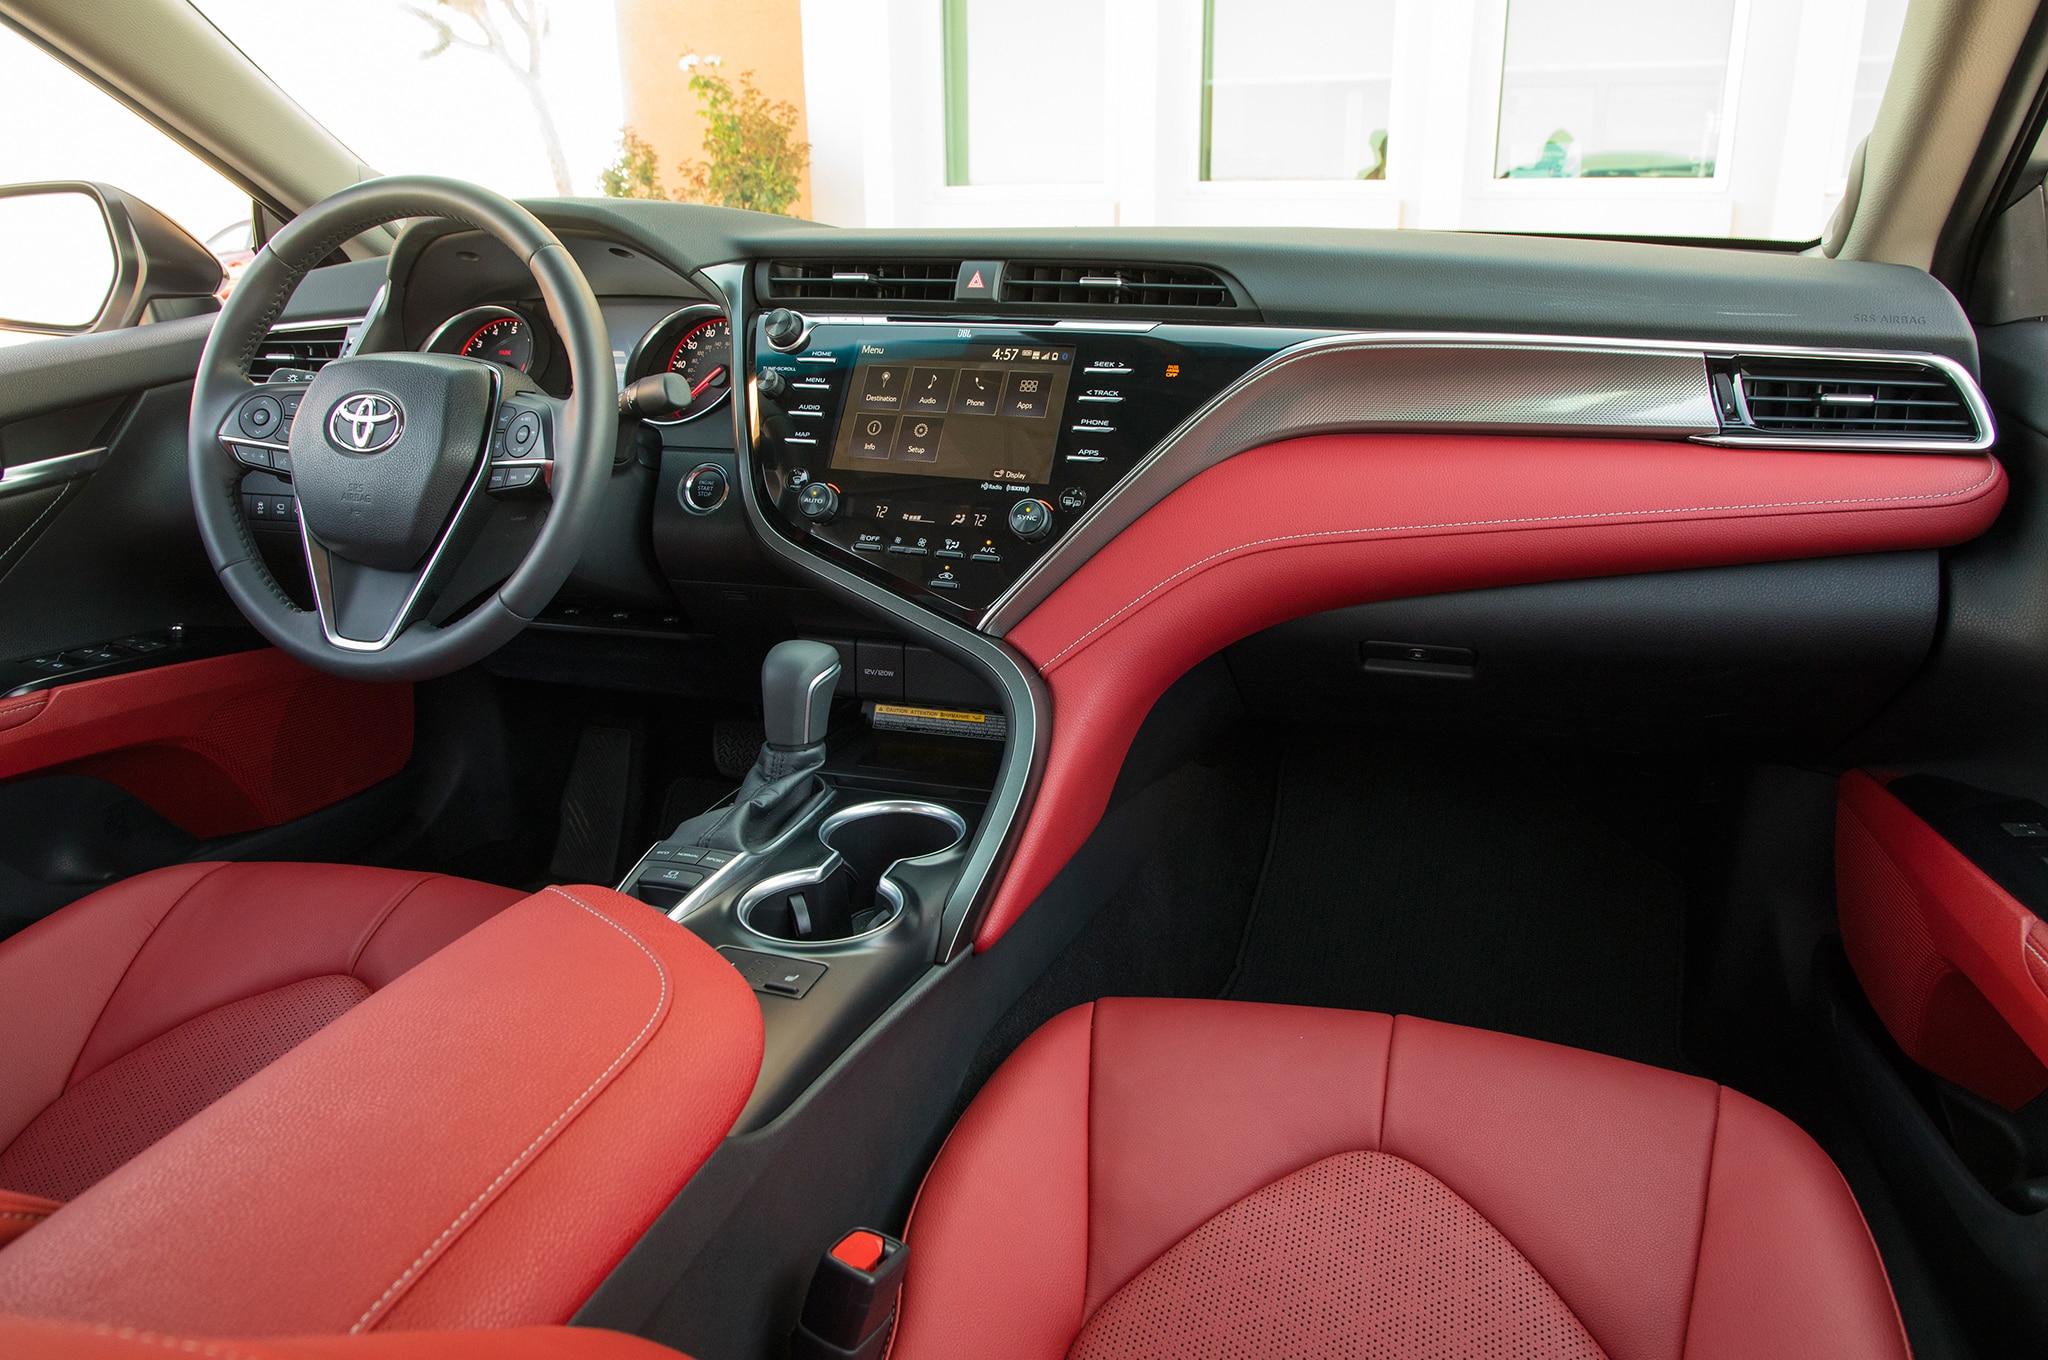 2018 Toyota Camry Xse Front Interior 01 Motor Trend En